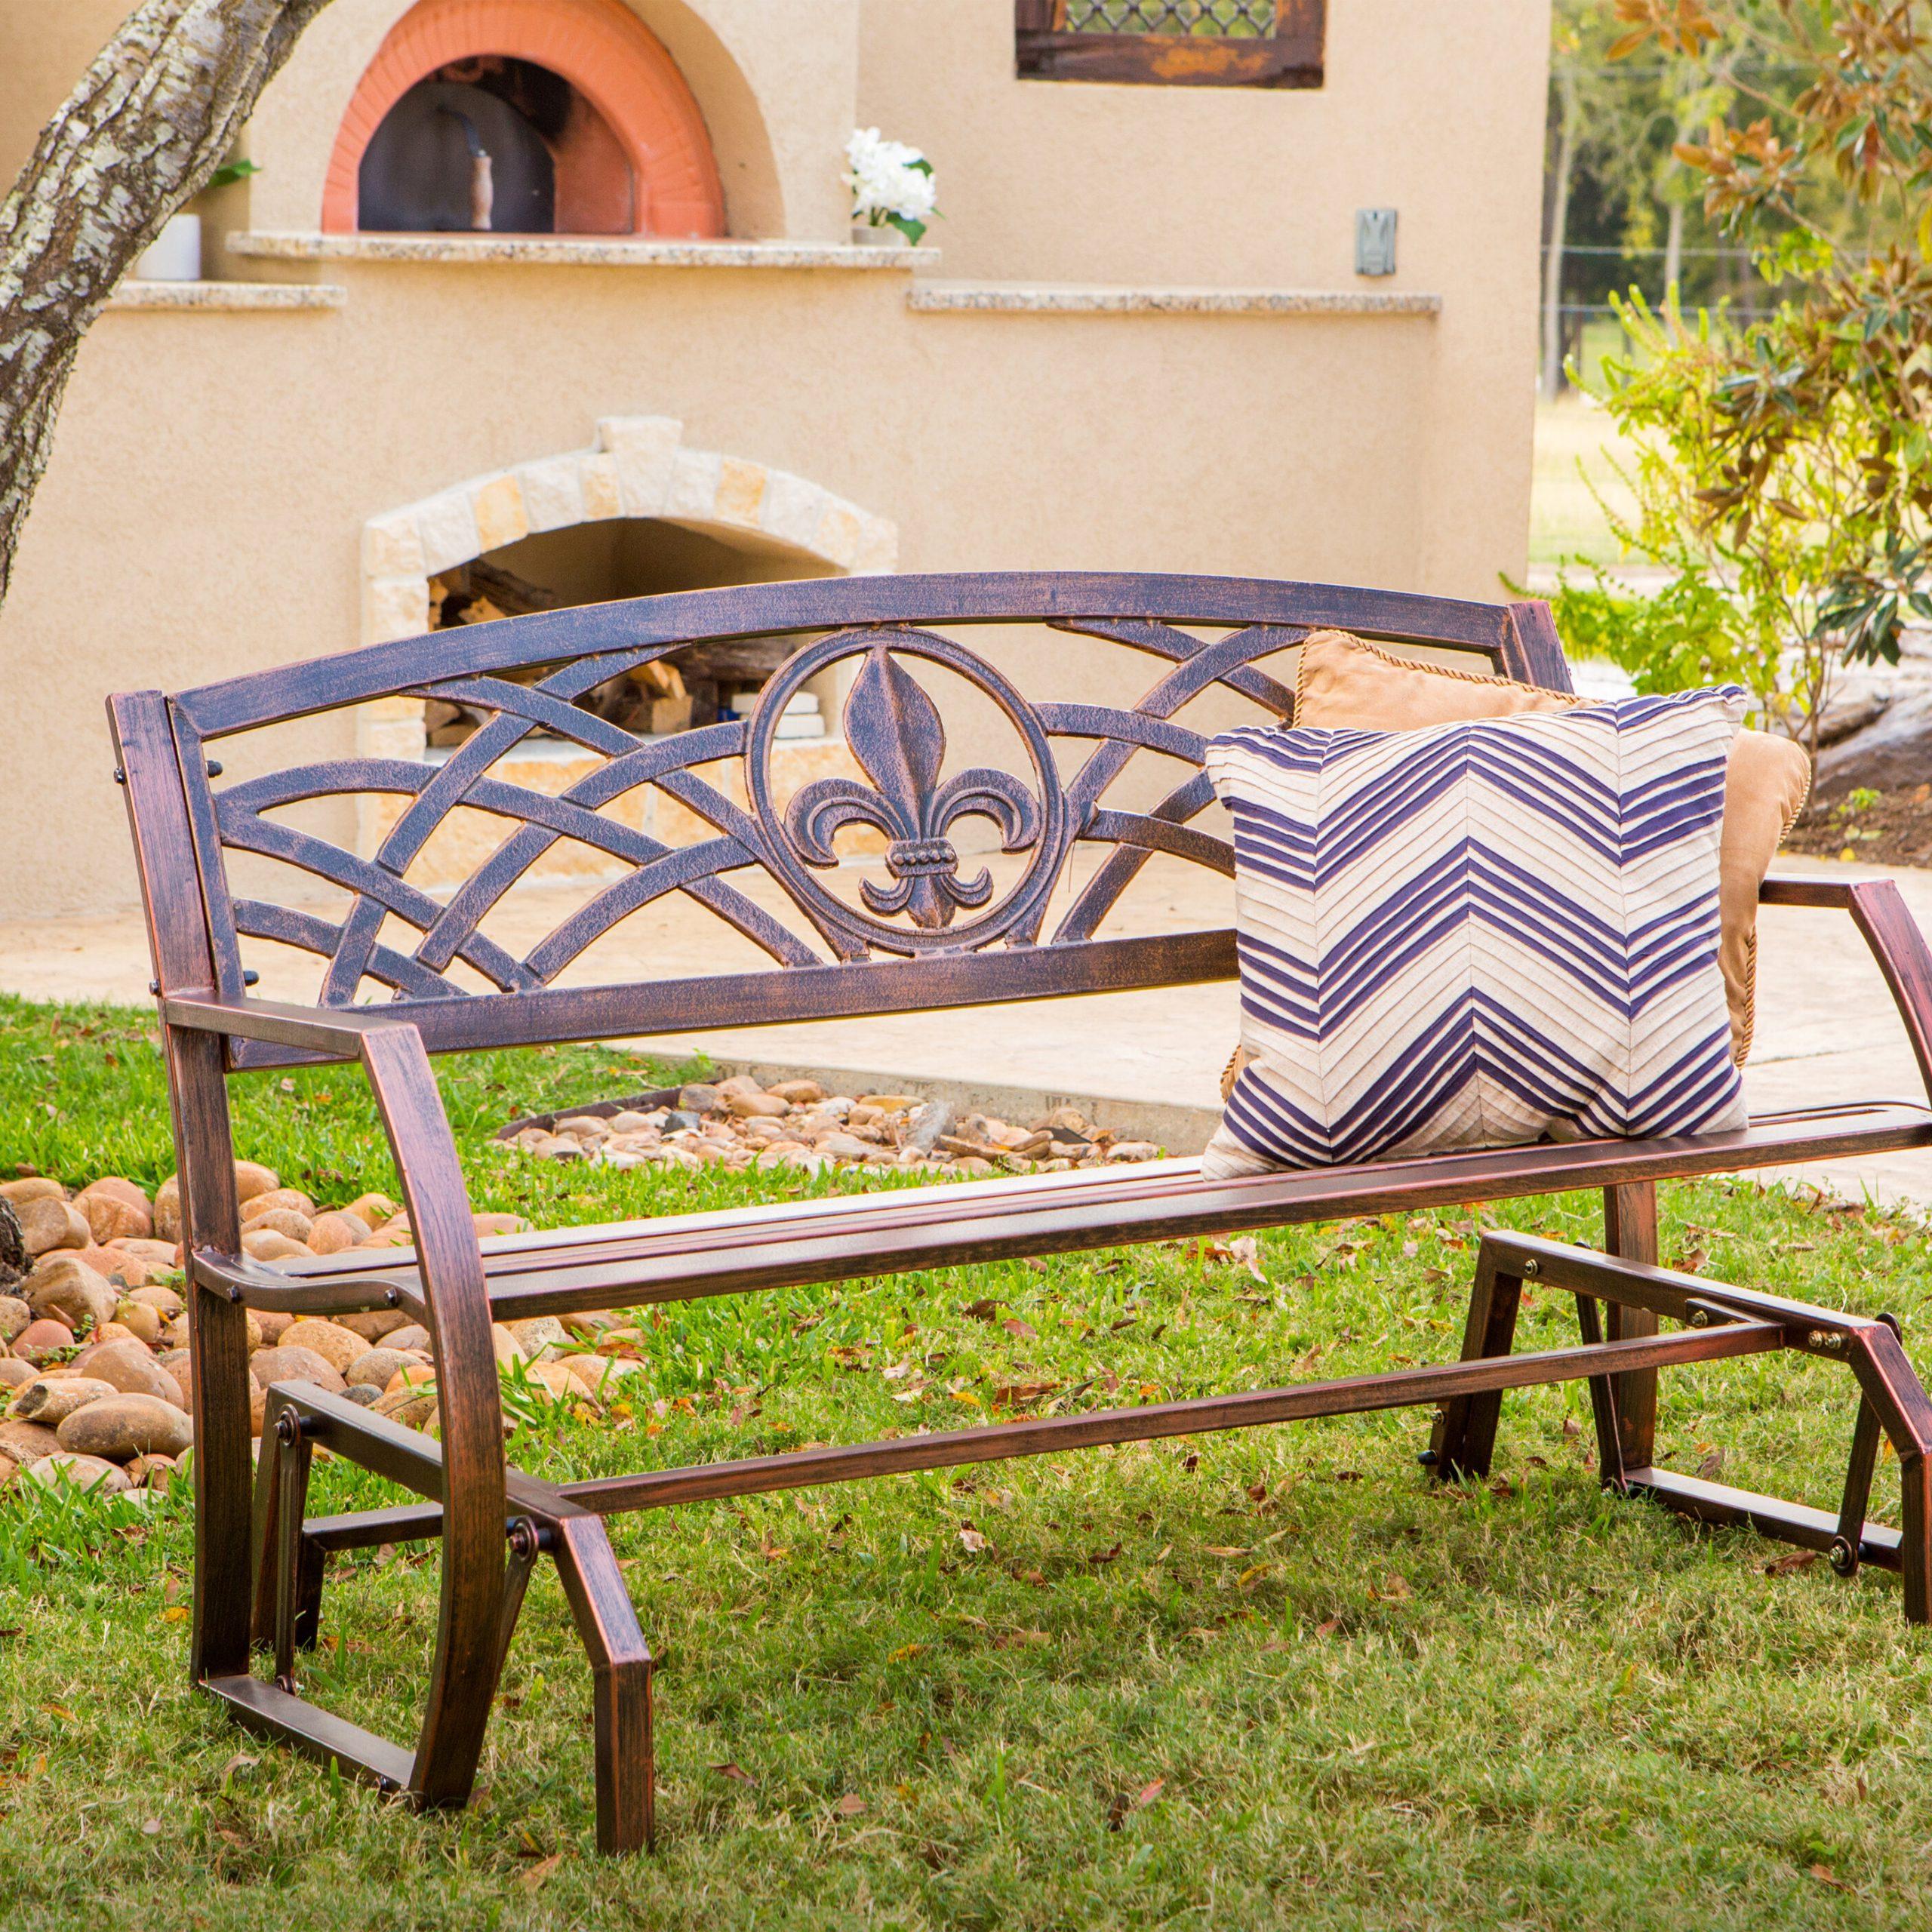 Trumann Fleur De Lis Glider Bench In Speckled Glider Benches (View 13 of 25)